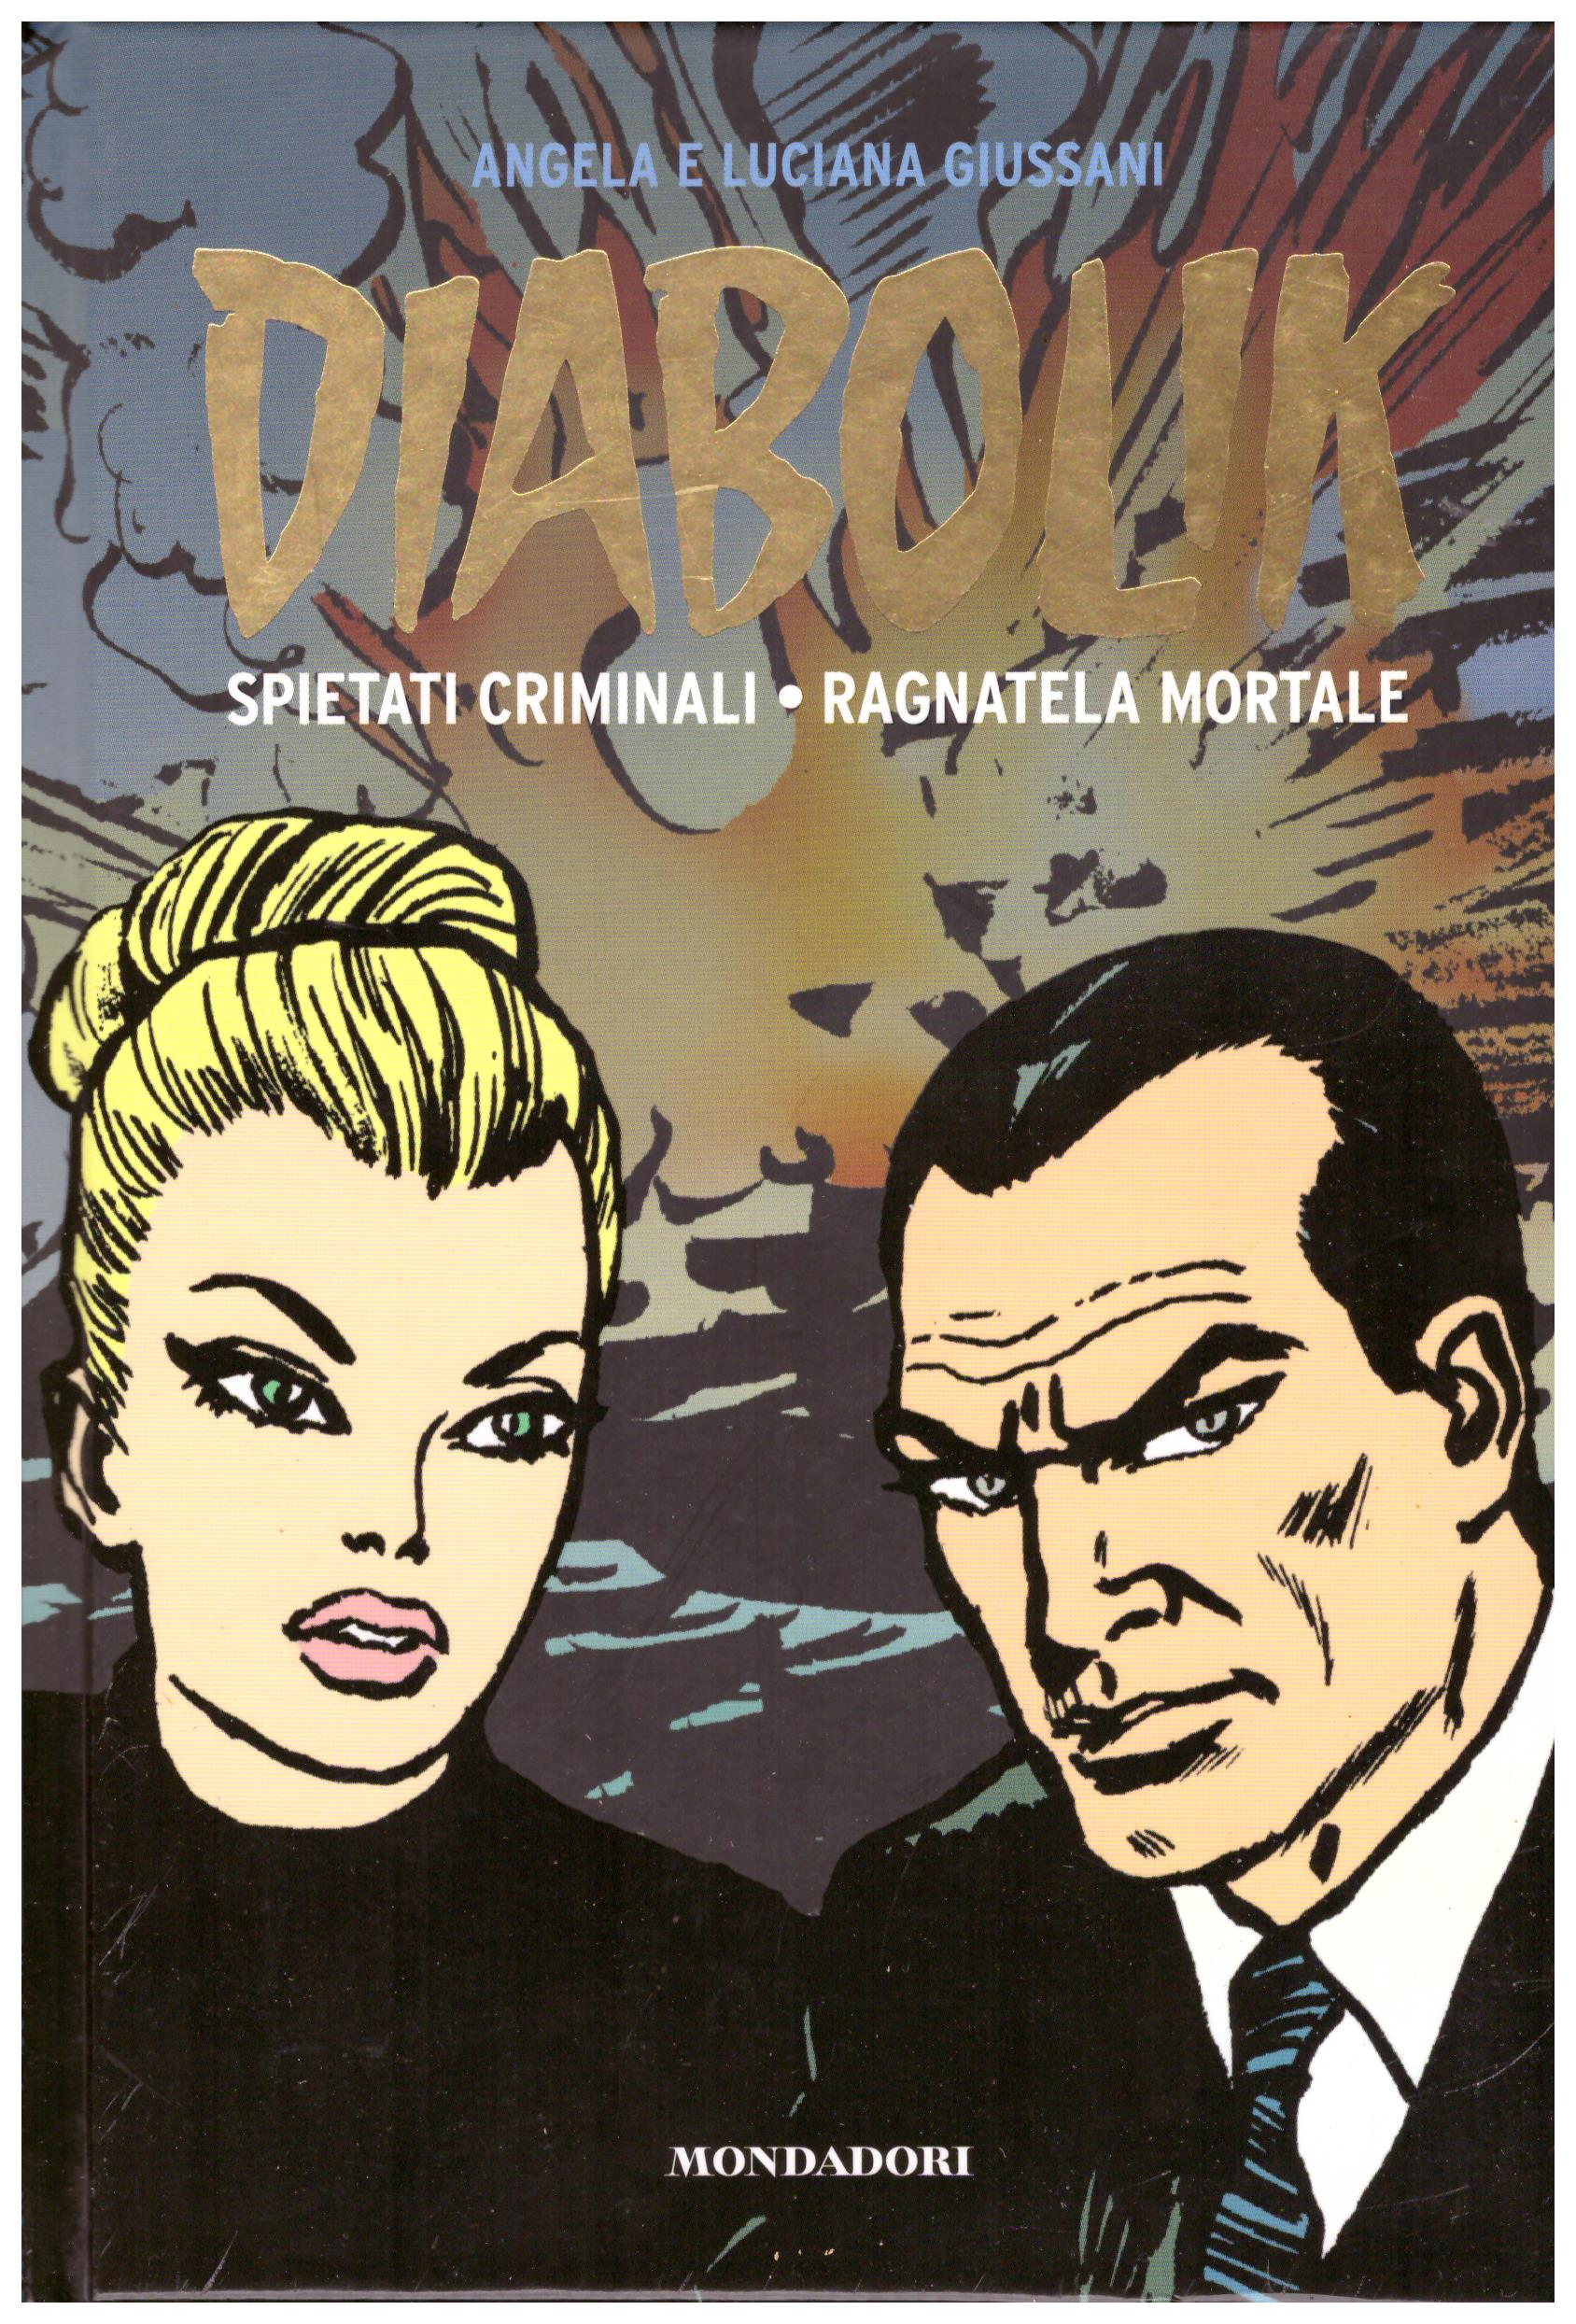 Titolo: Diabolik, spietati criminali, ragnatela mortale Autore: AA.VV.  Editore: Mondadori, 2010